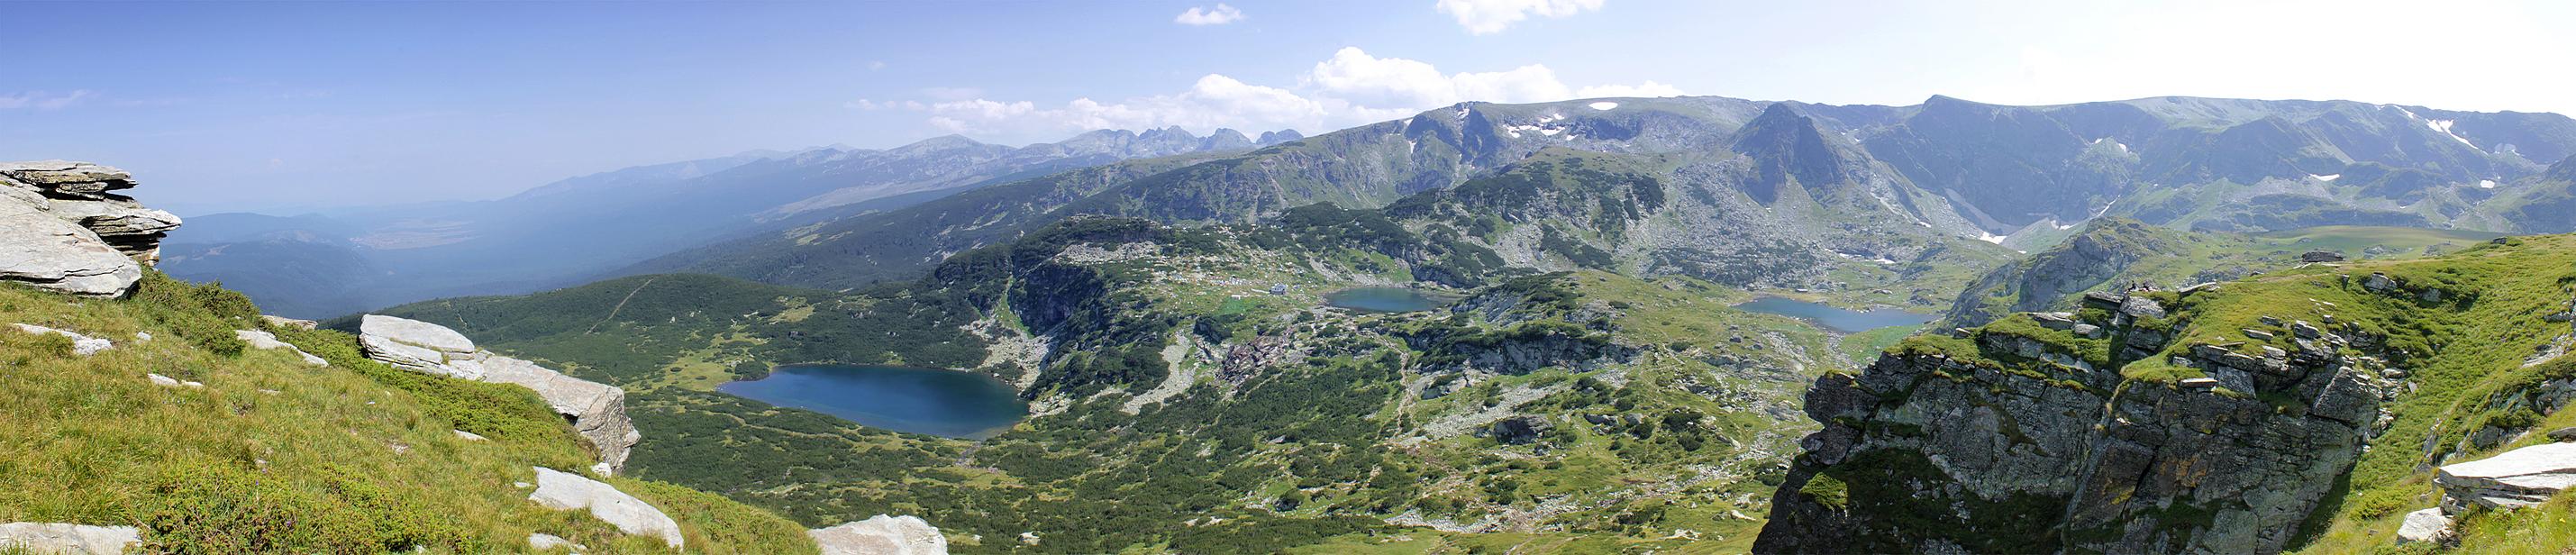 Seven Lakes panorama by lapis-lazuri